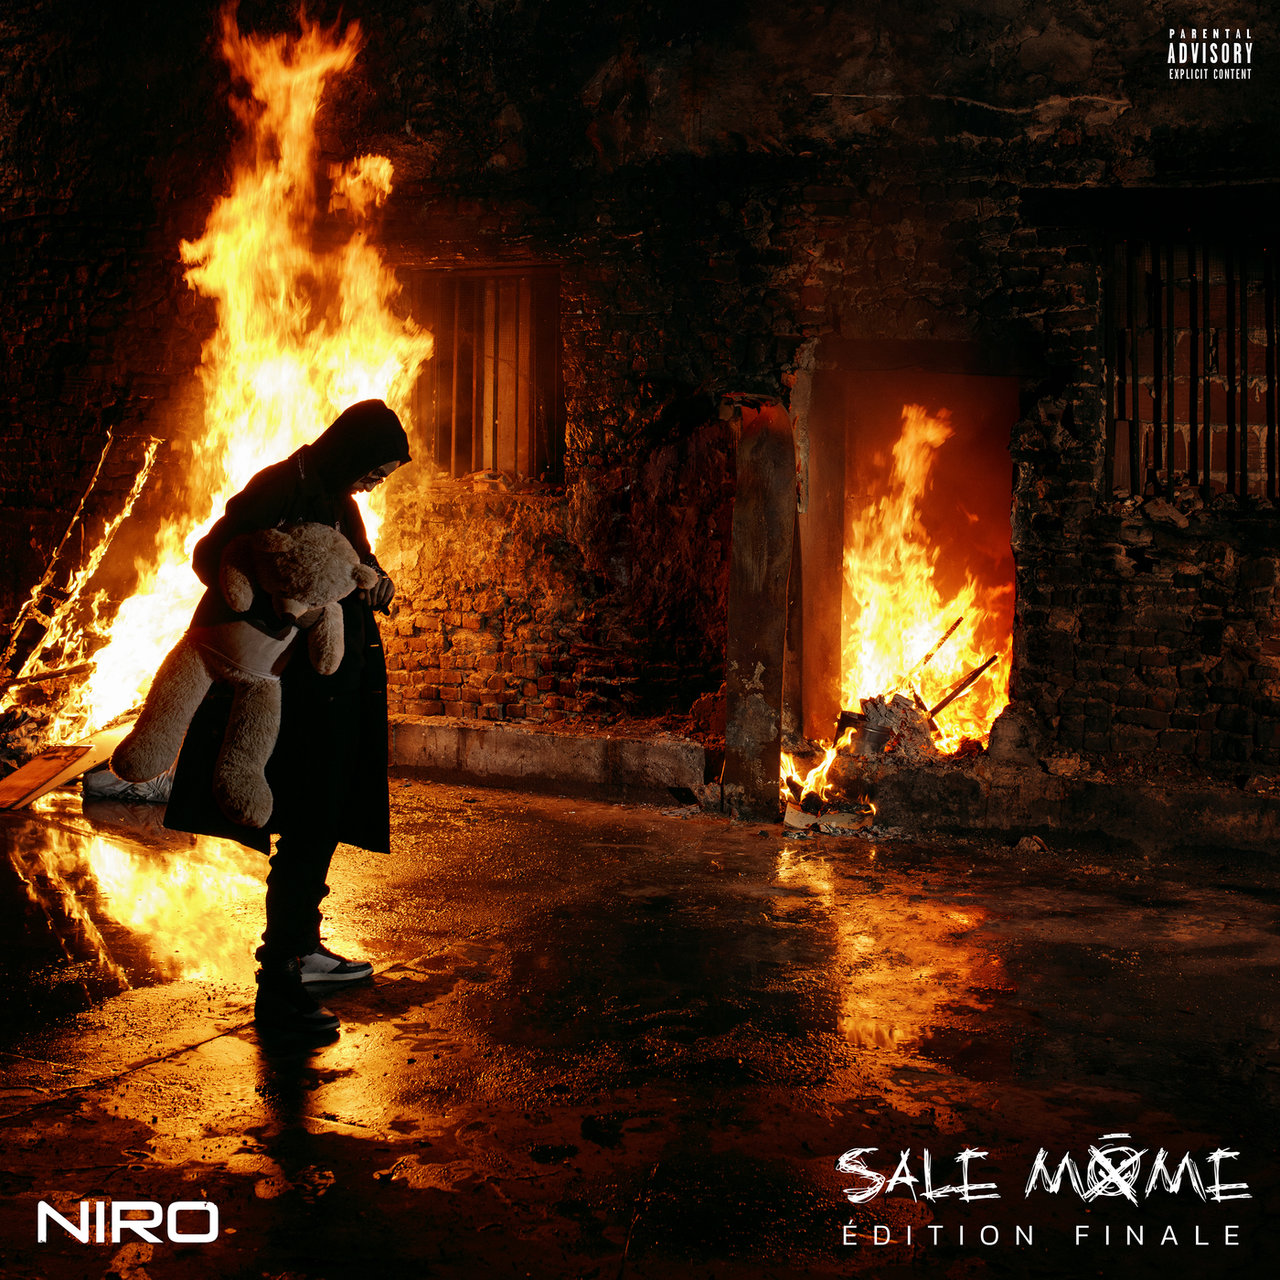 Niro - Sale Môme (Edition Finale) (Cover)